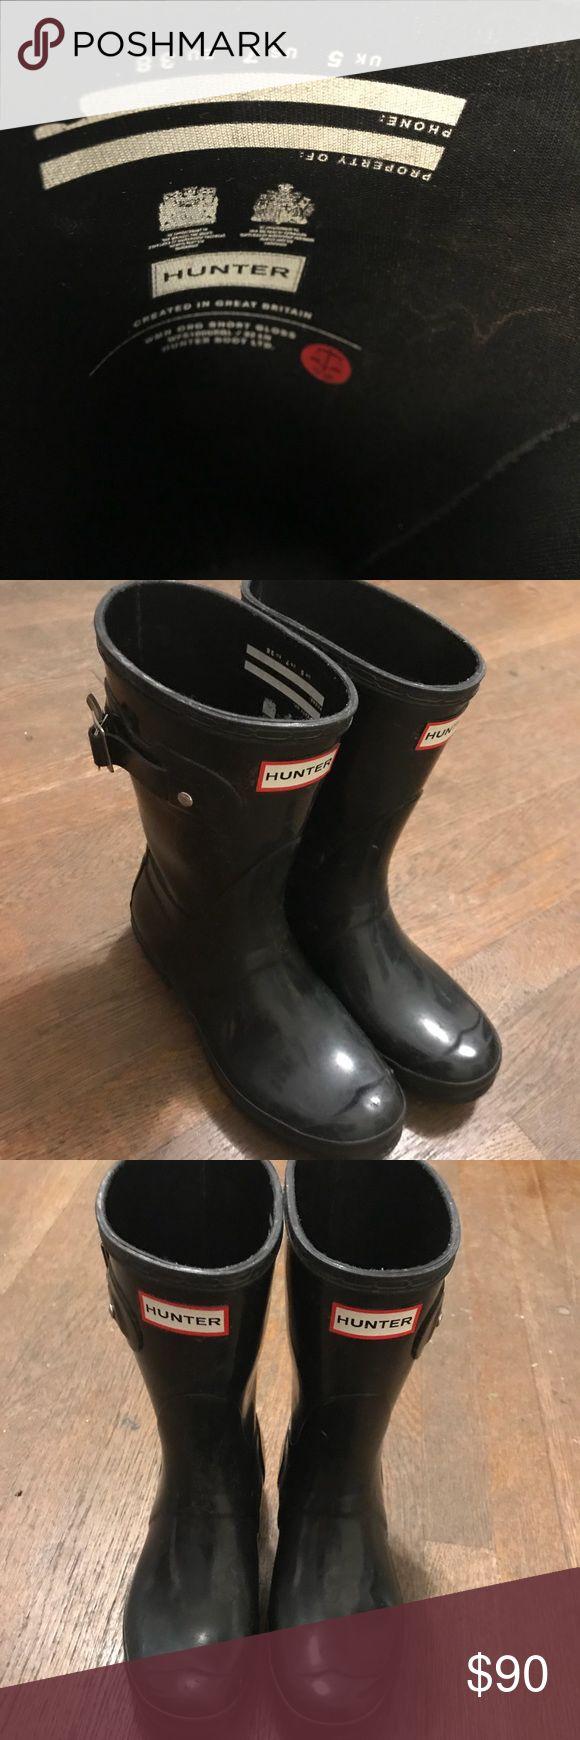 Hunter Rain Boots Medium Length Amazing shape! Black Size 7 Hunter Boots Shoes Winter & Rain Boots